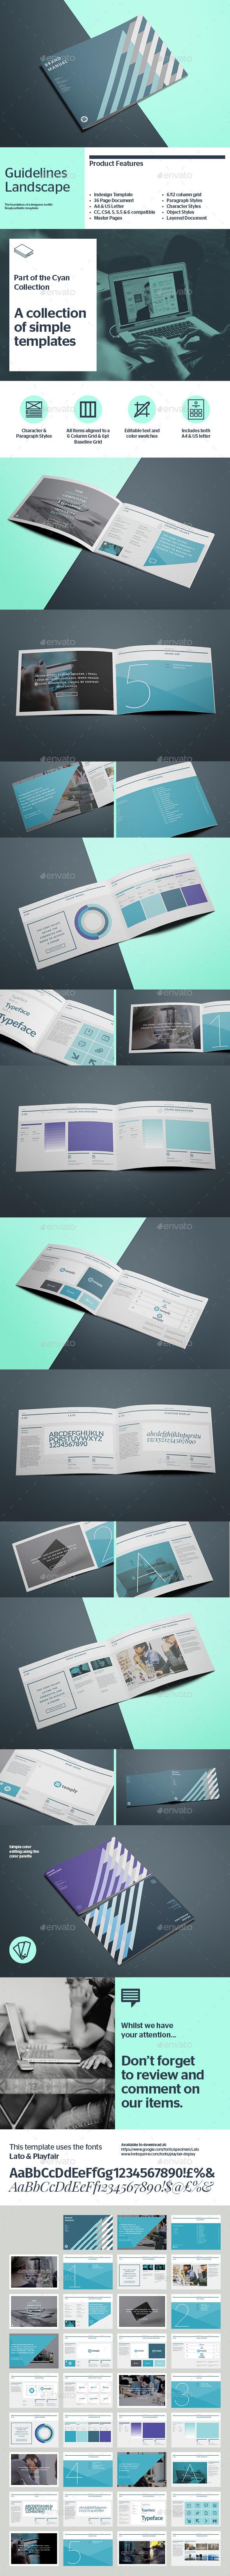 Brand Manual Horizontal - Informational Brochures